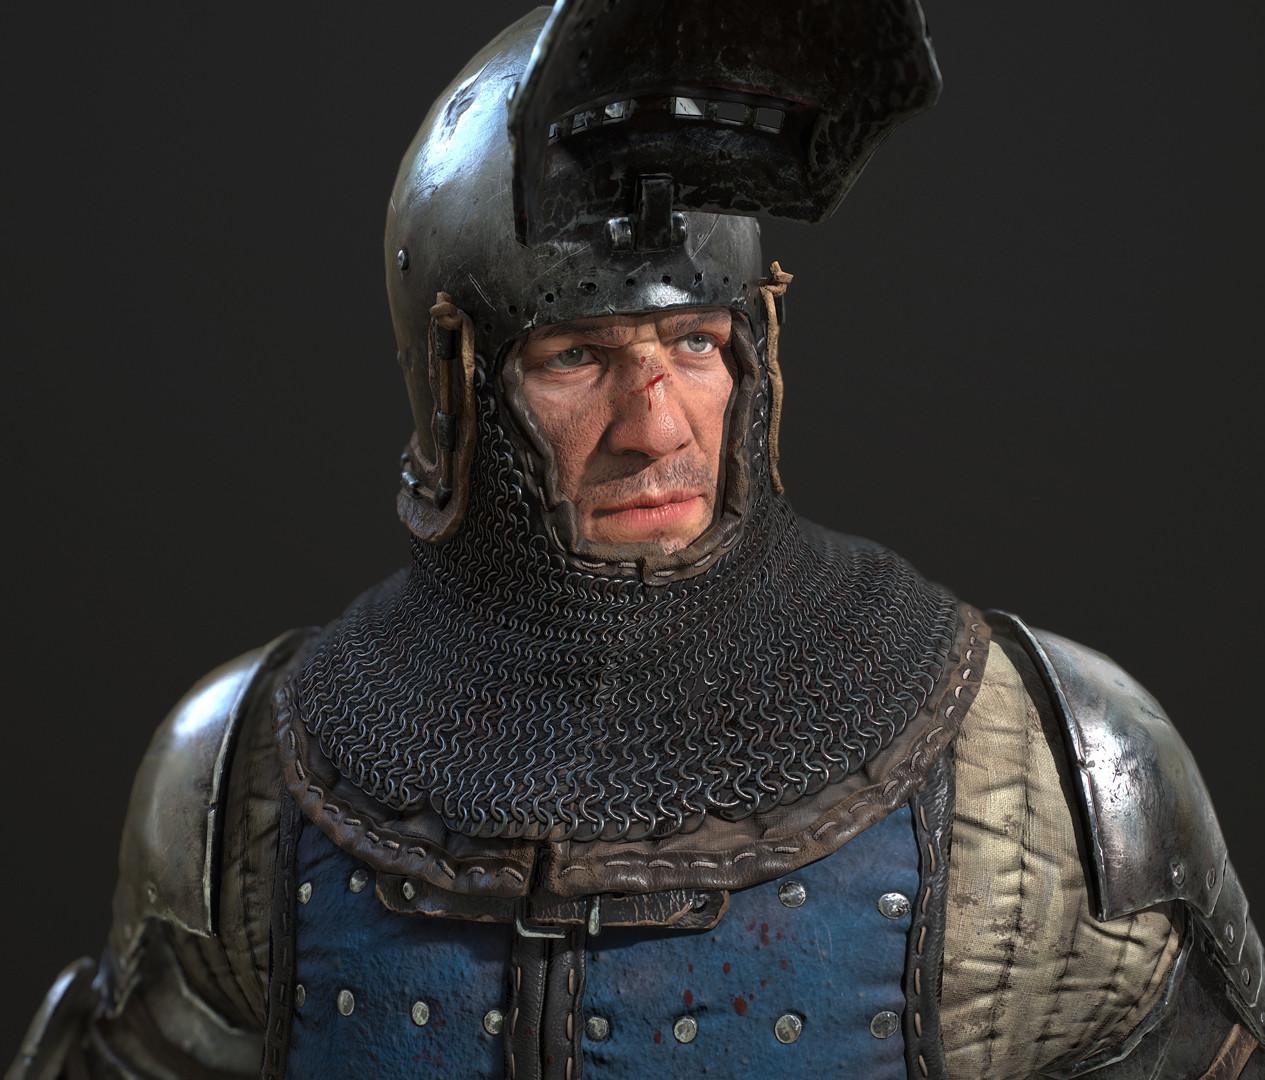 Petr sokolov artpity knight lp portrait